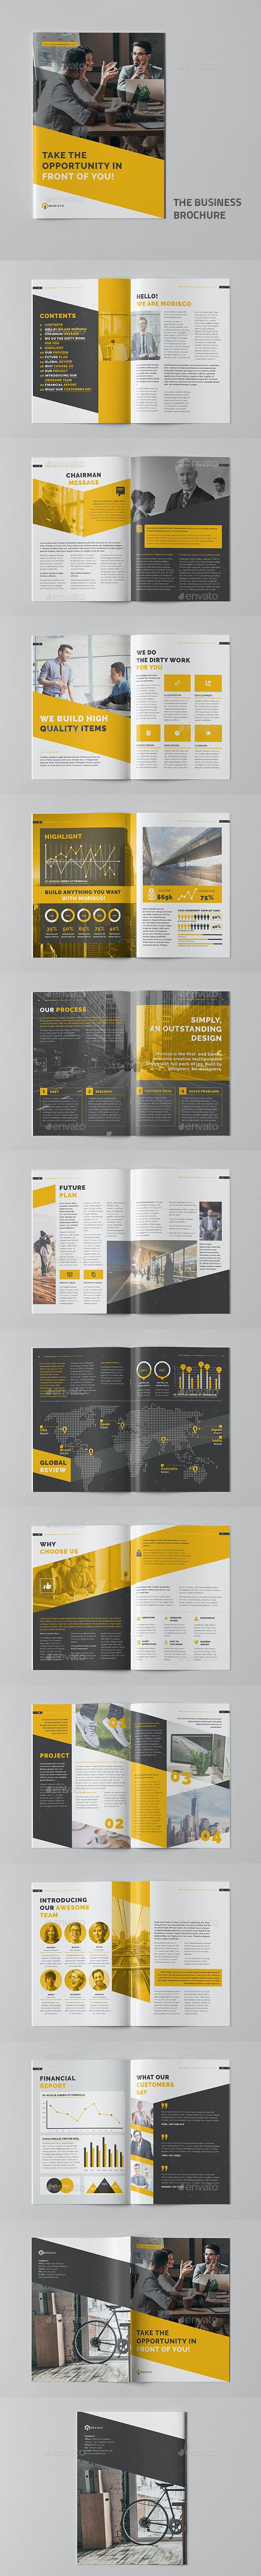 The Business Brochure - Corporate Brochures